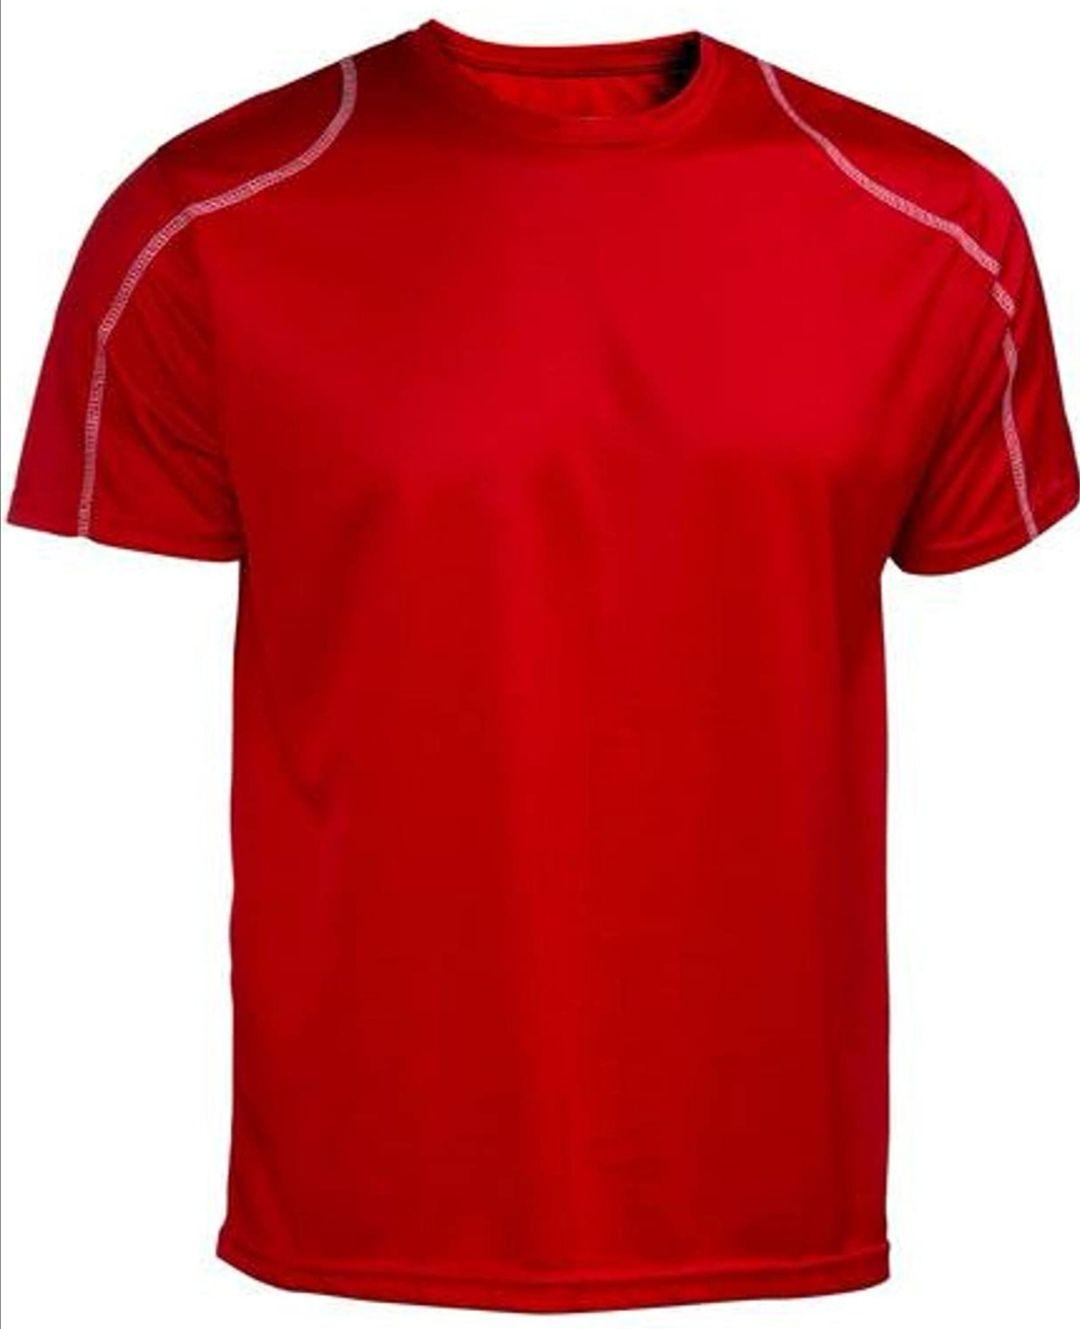 RECOPILACIÓN Camiseta deportiva transpirable Manga Corta, Unisex Adulto